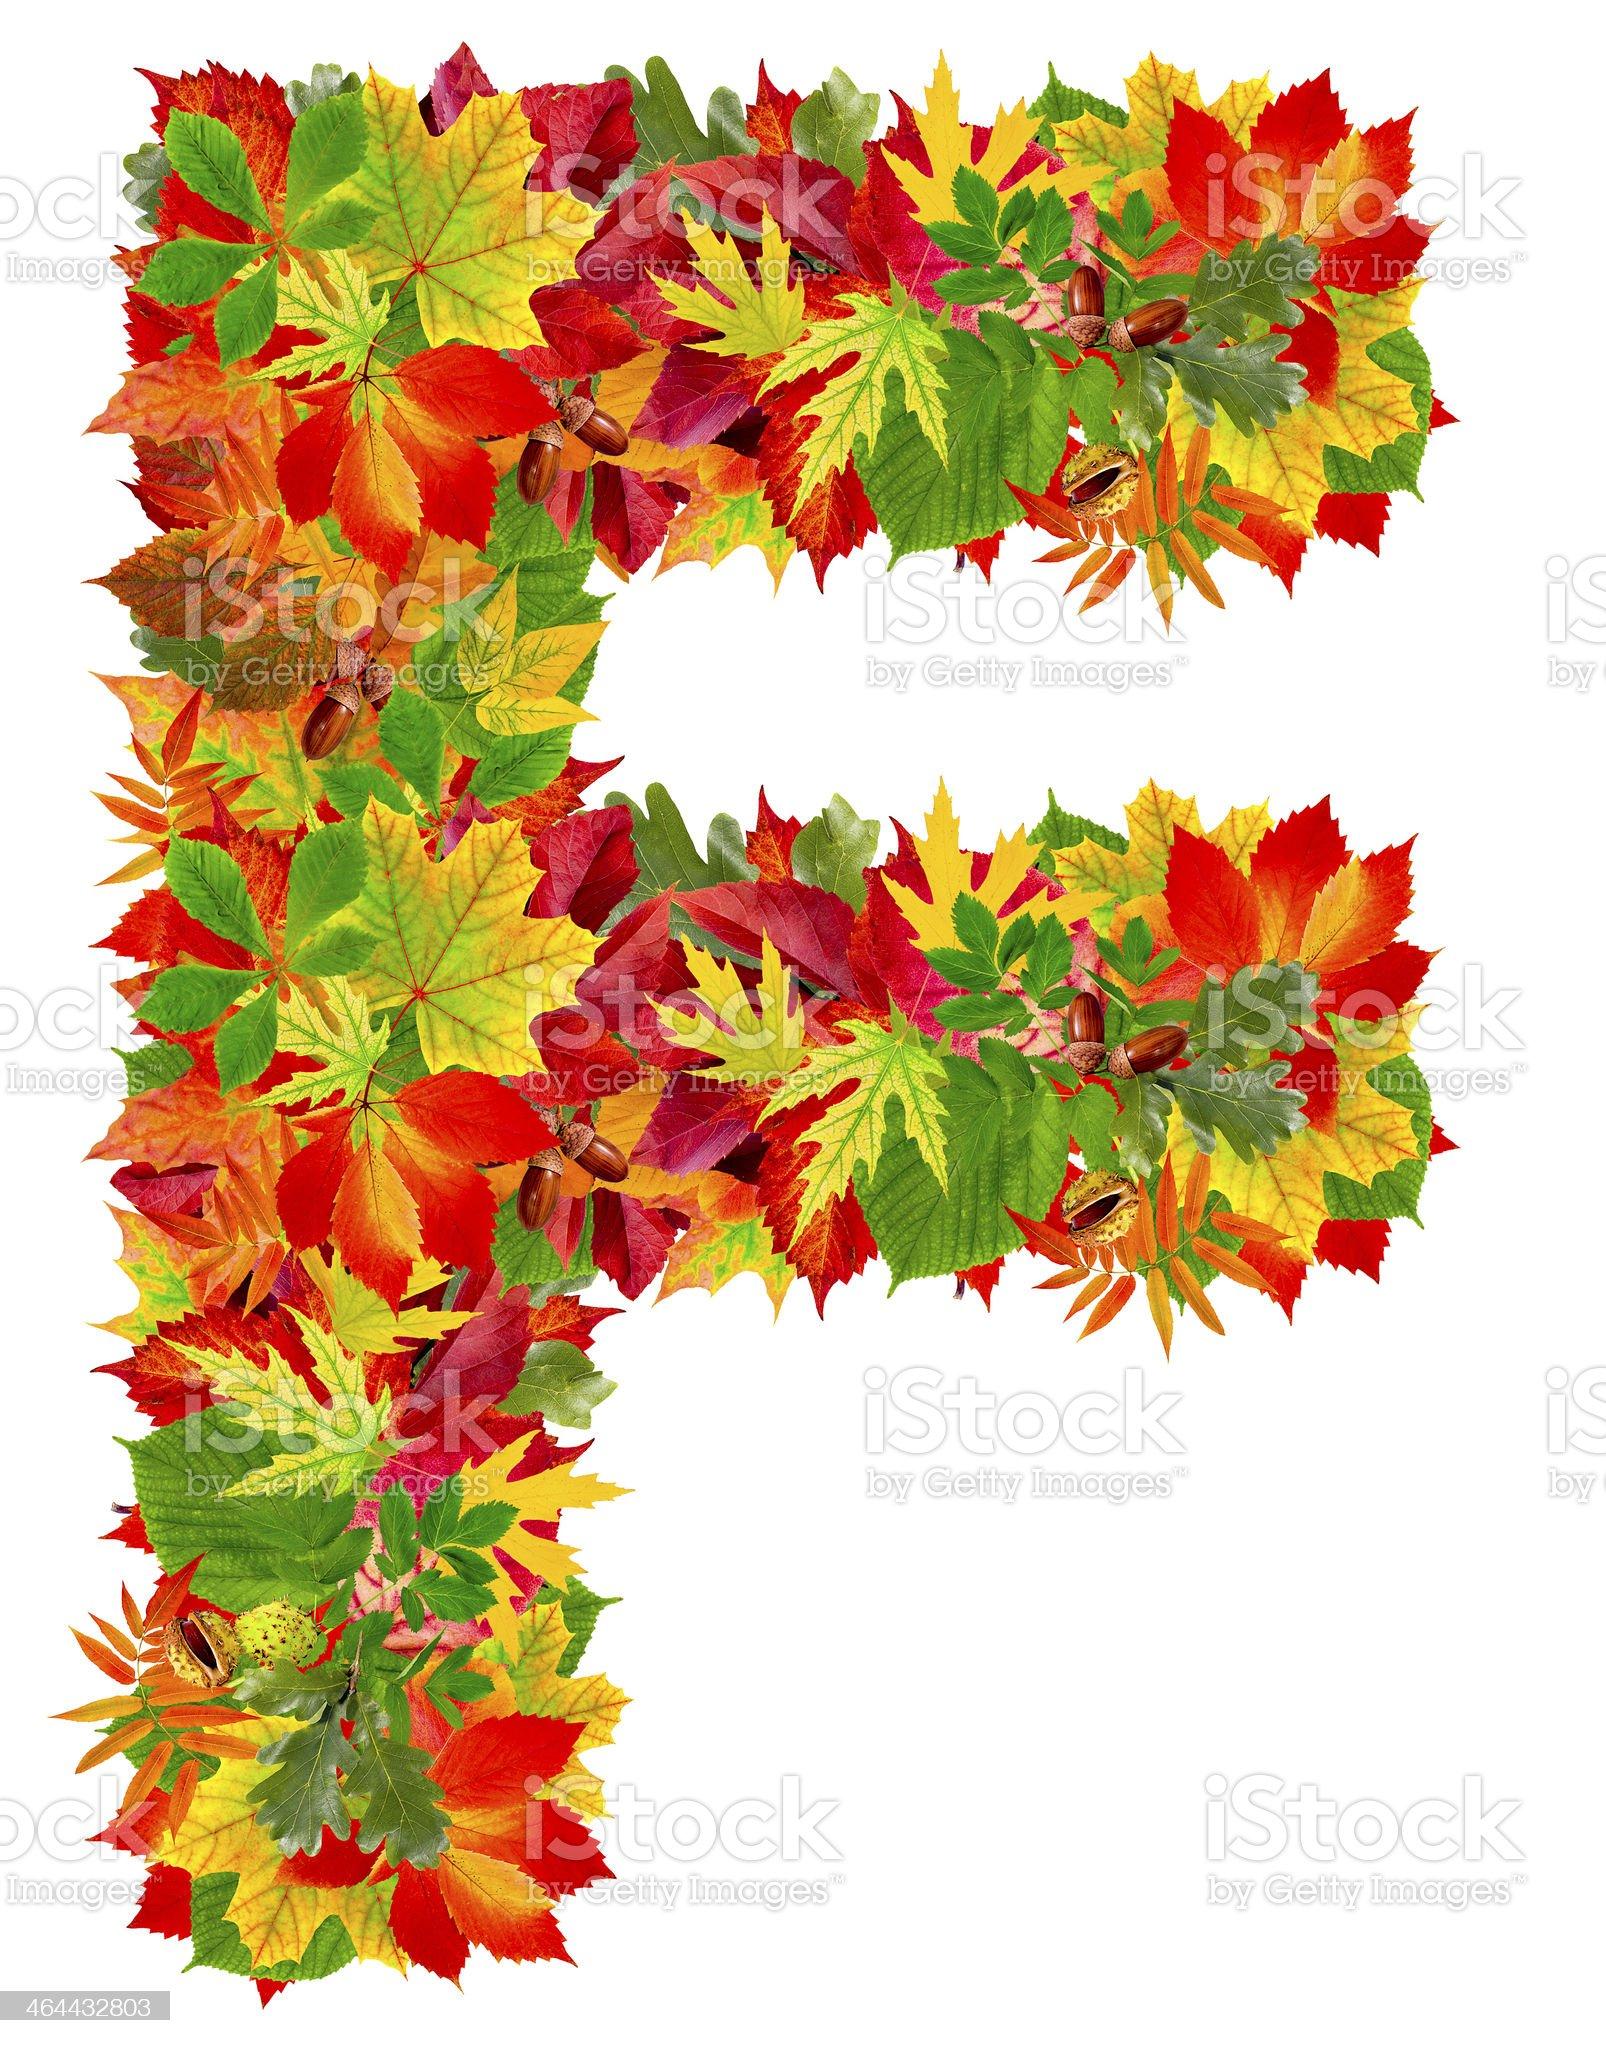 F, autumn alphabet isolated on white royalty-free stock photo